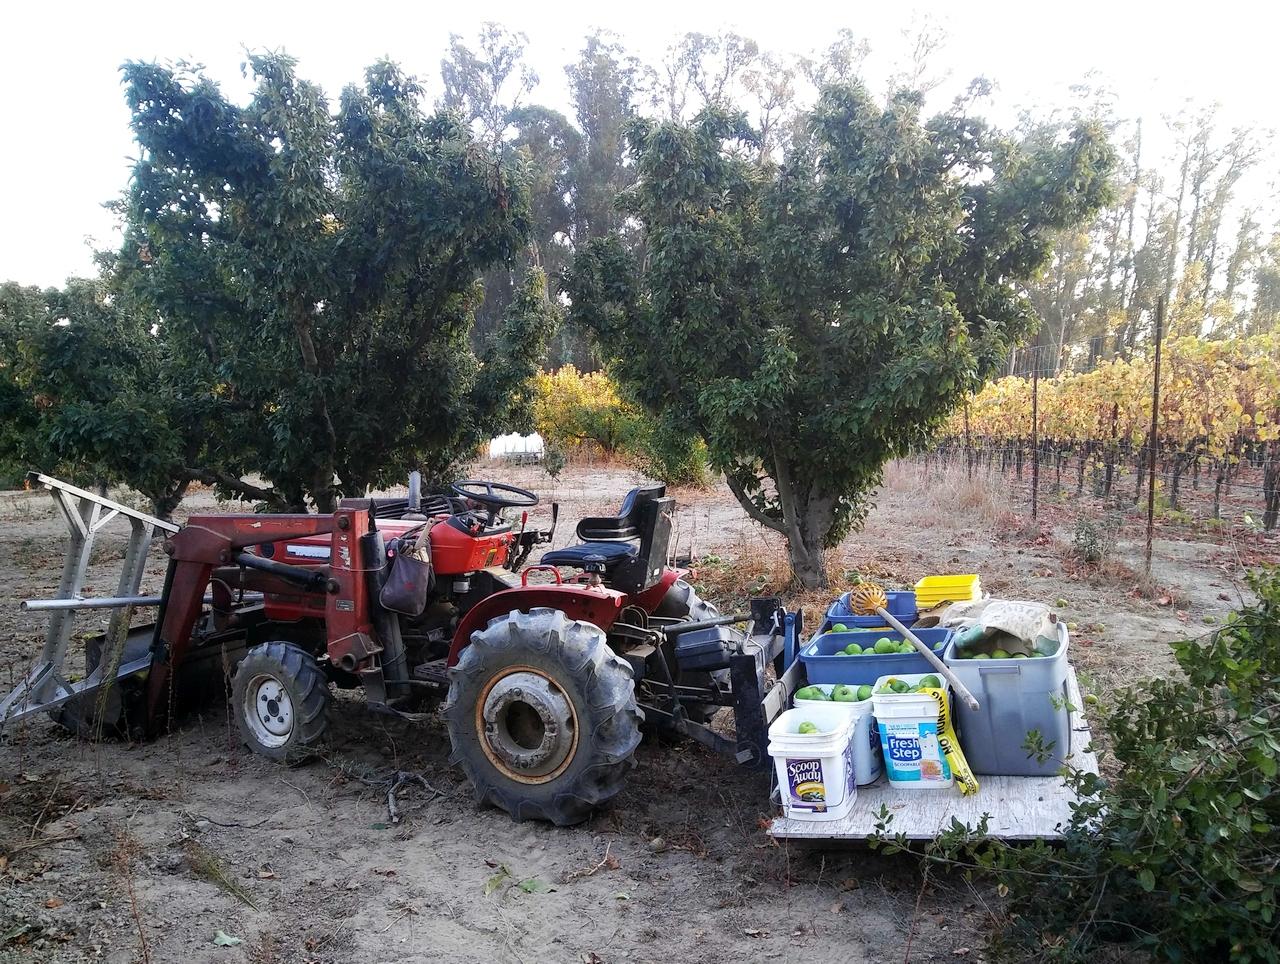 20191106_163749rym186d-harvestgrannies-jpg.633196